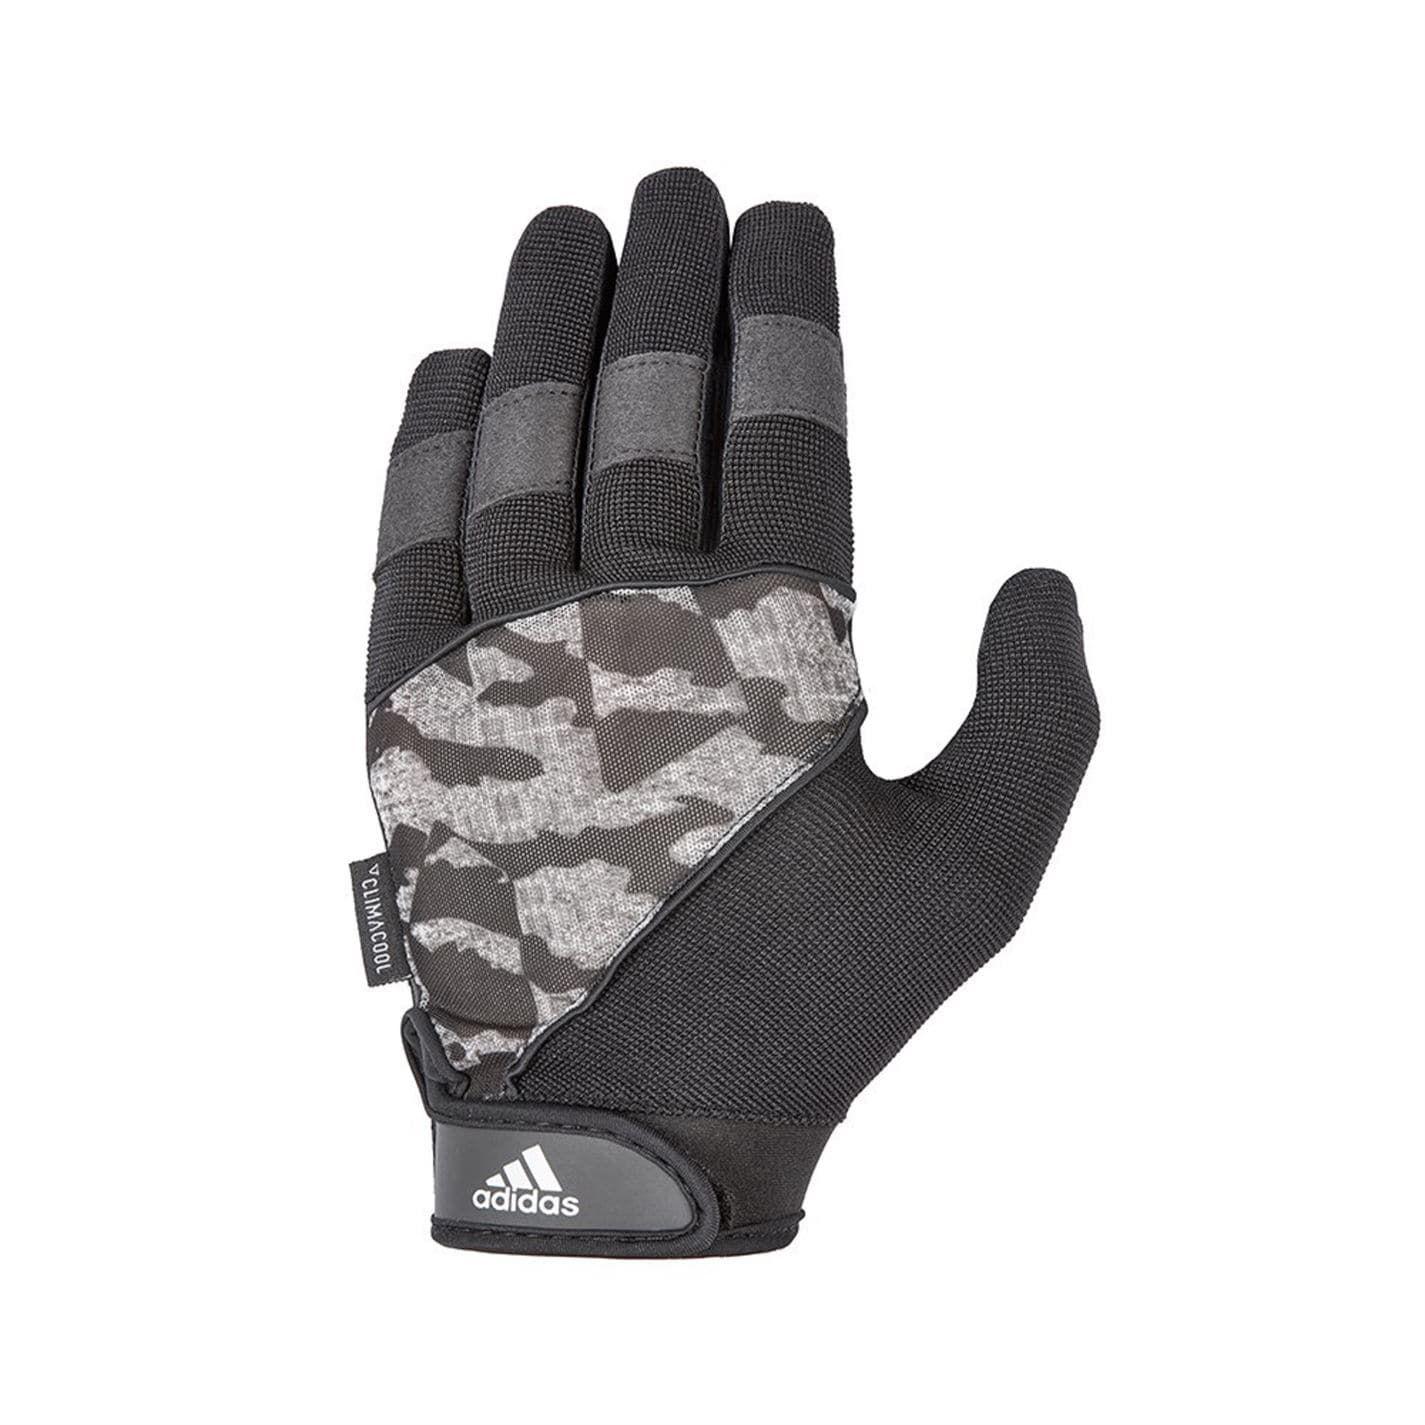 Desagradable Censo nacional Comercial  Adidas Full Finger Performance Gloves на ХИТ цена — Mymall.bg